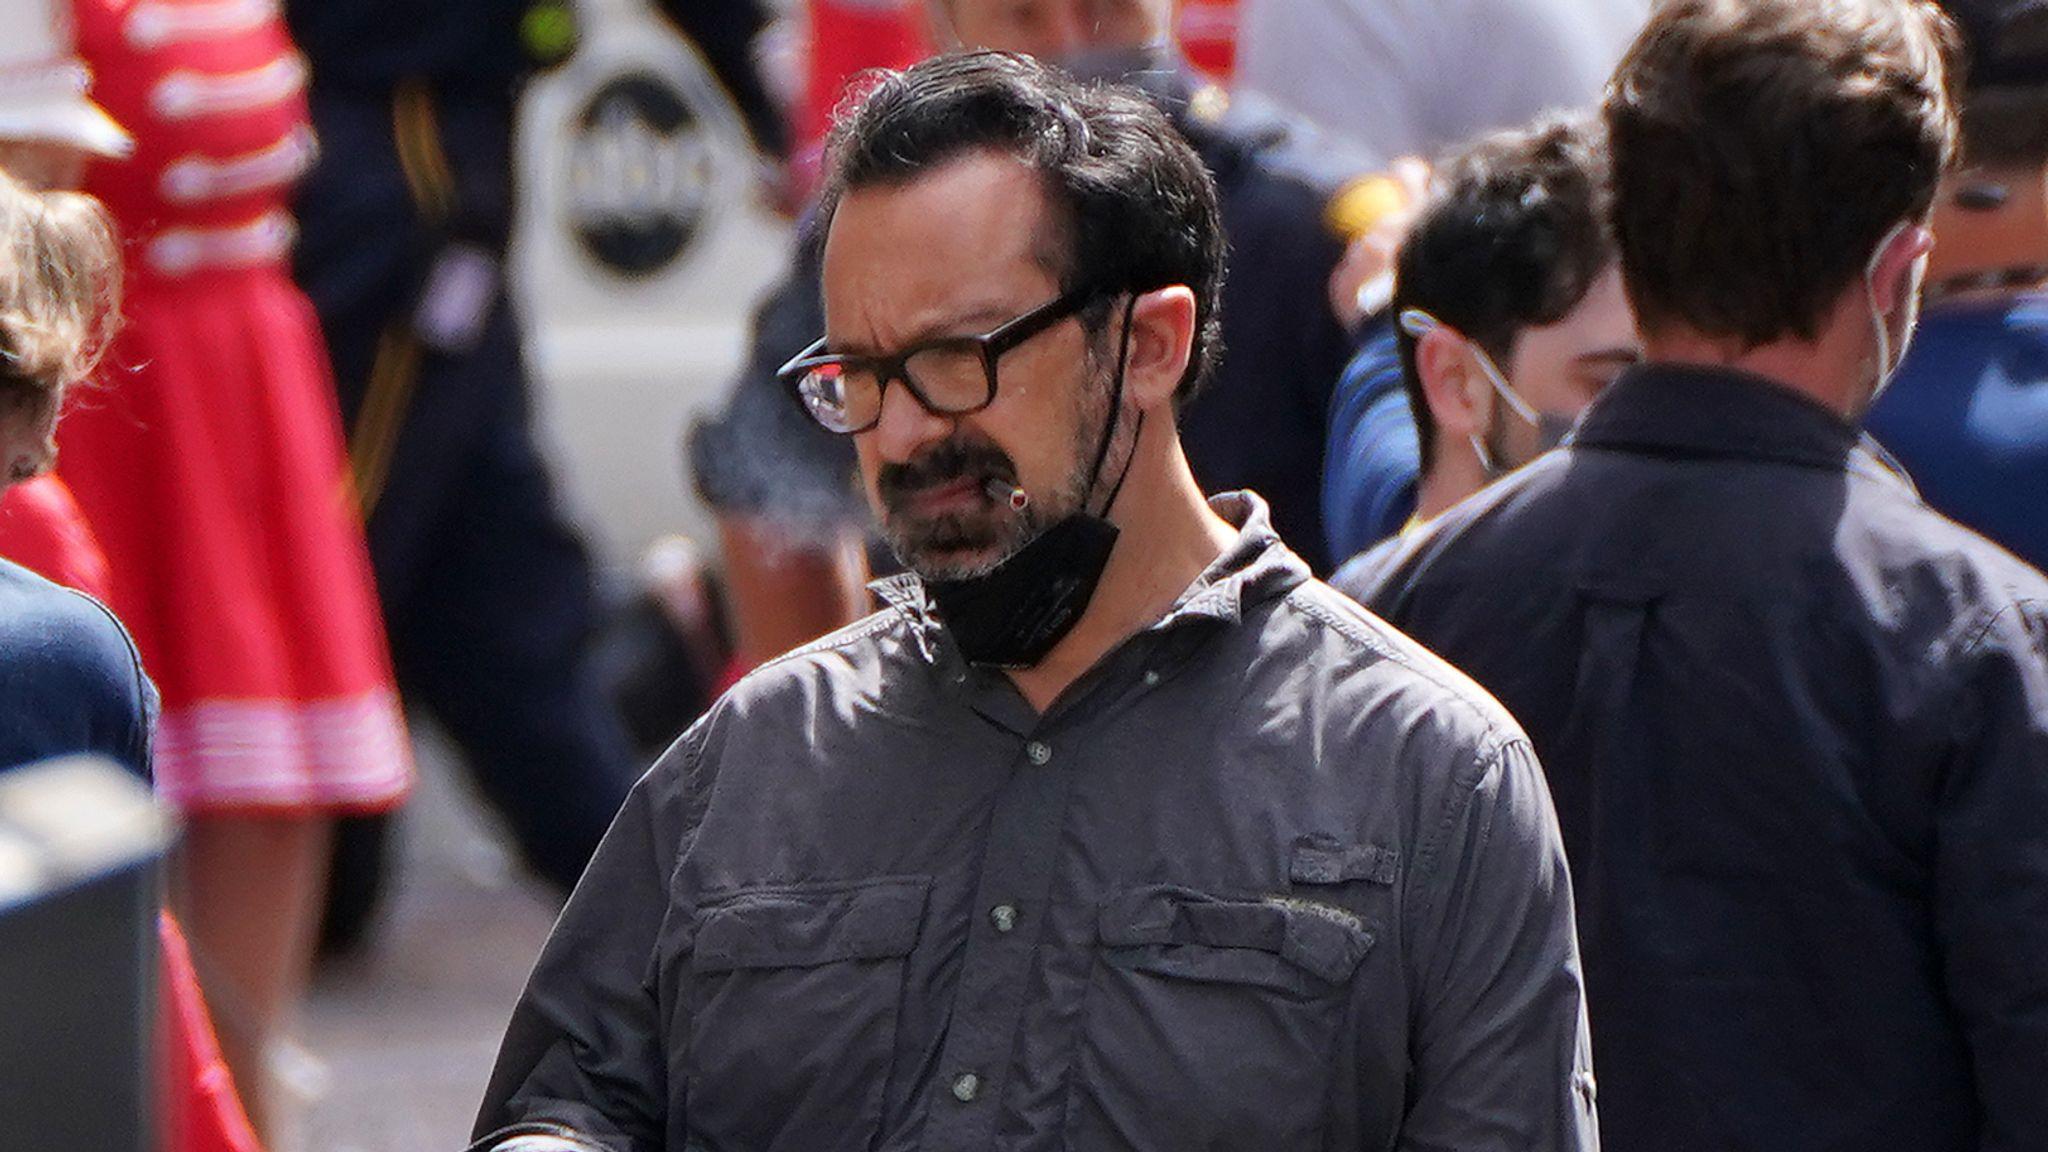 Director James Mangold was seen on set